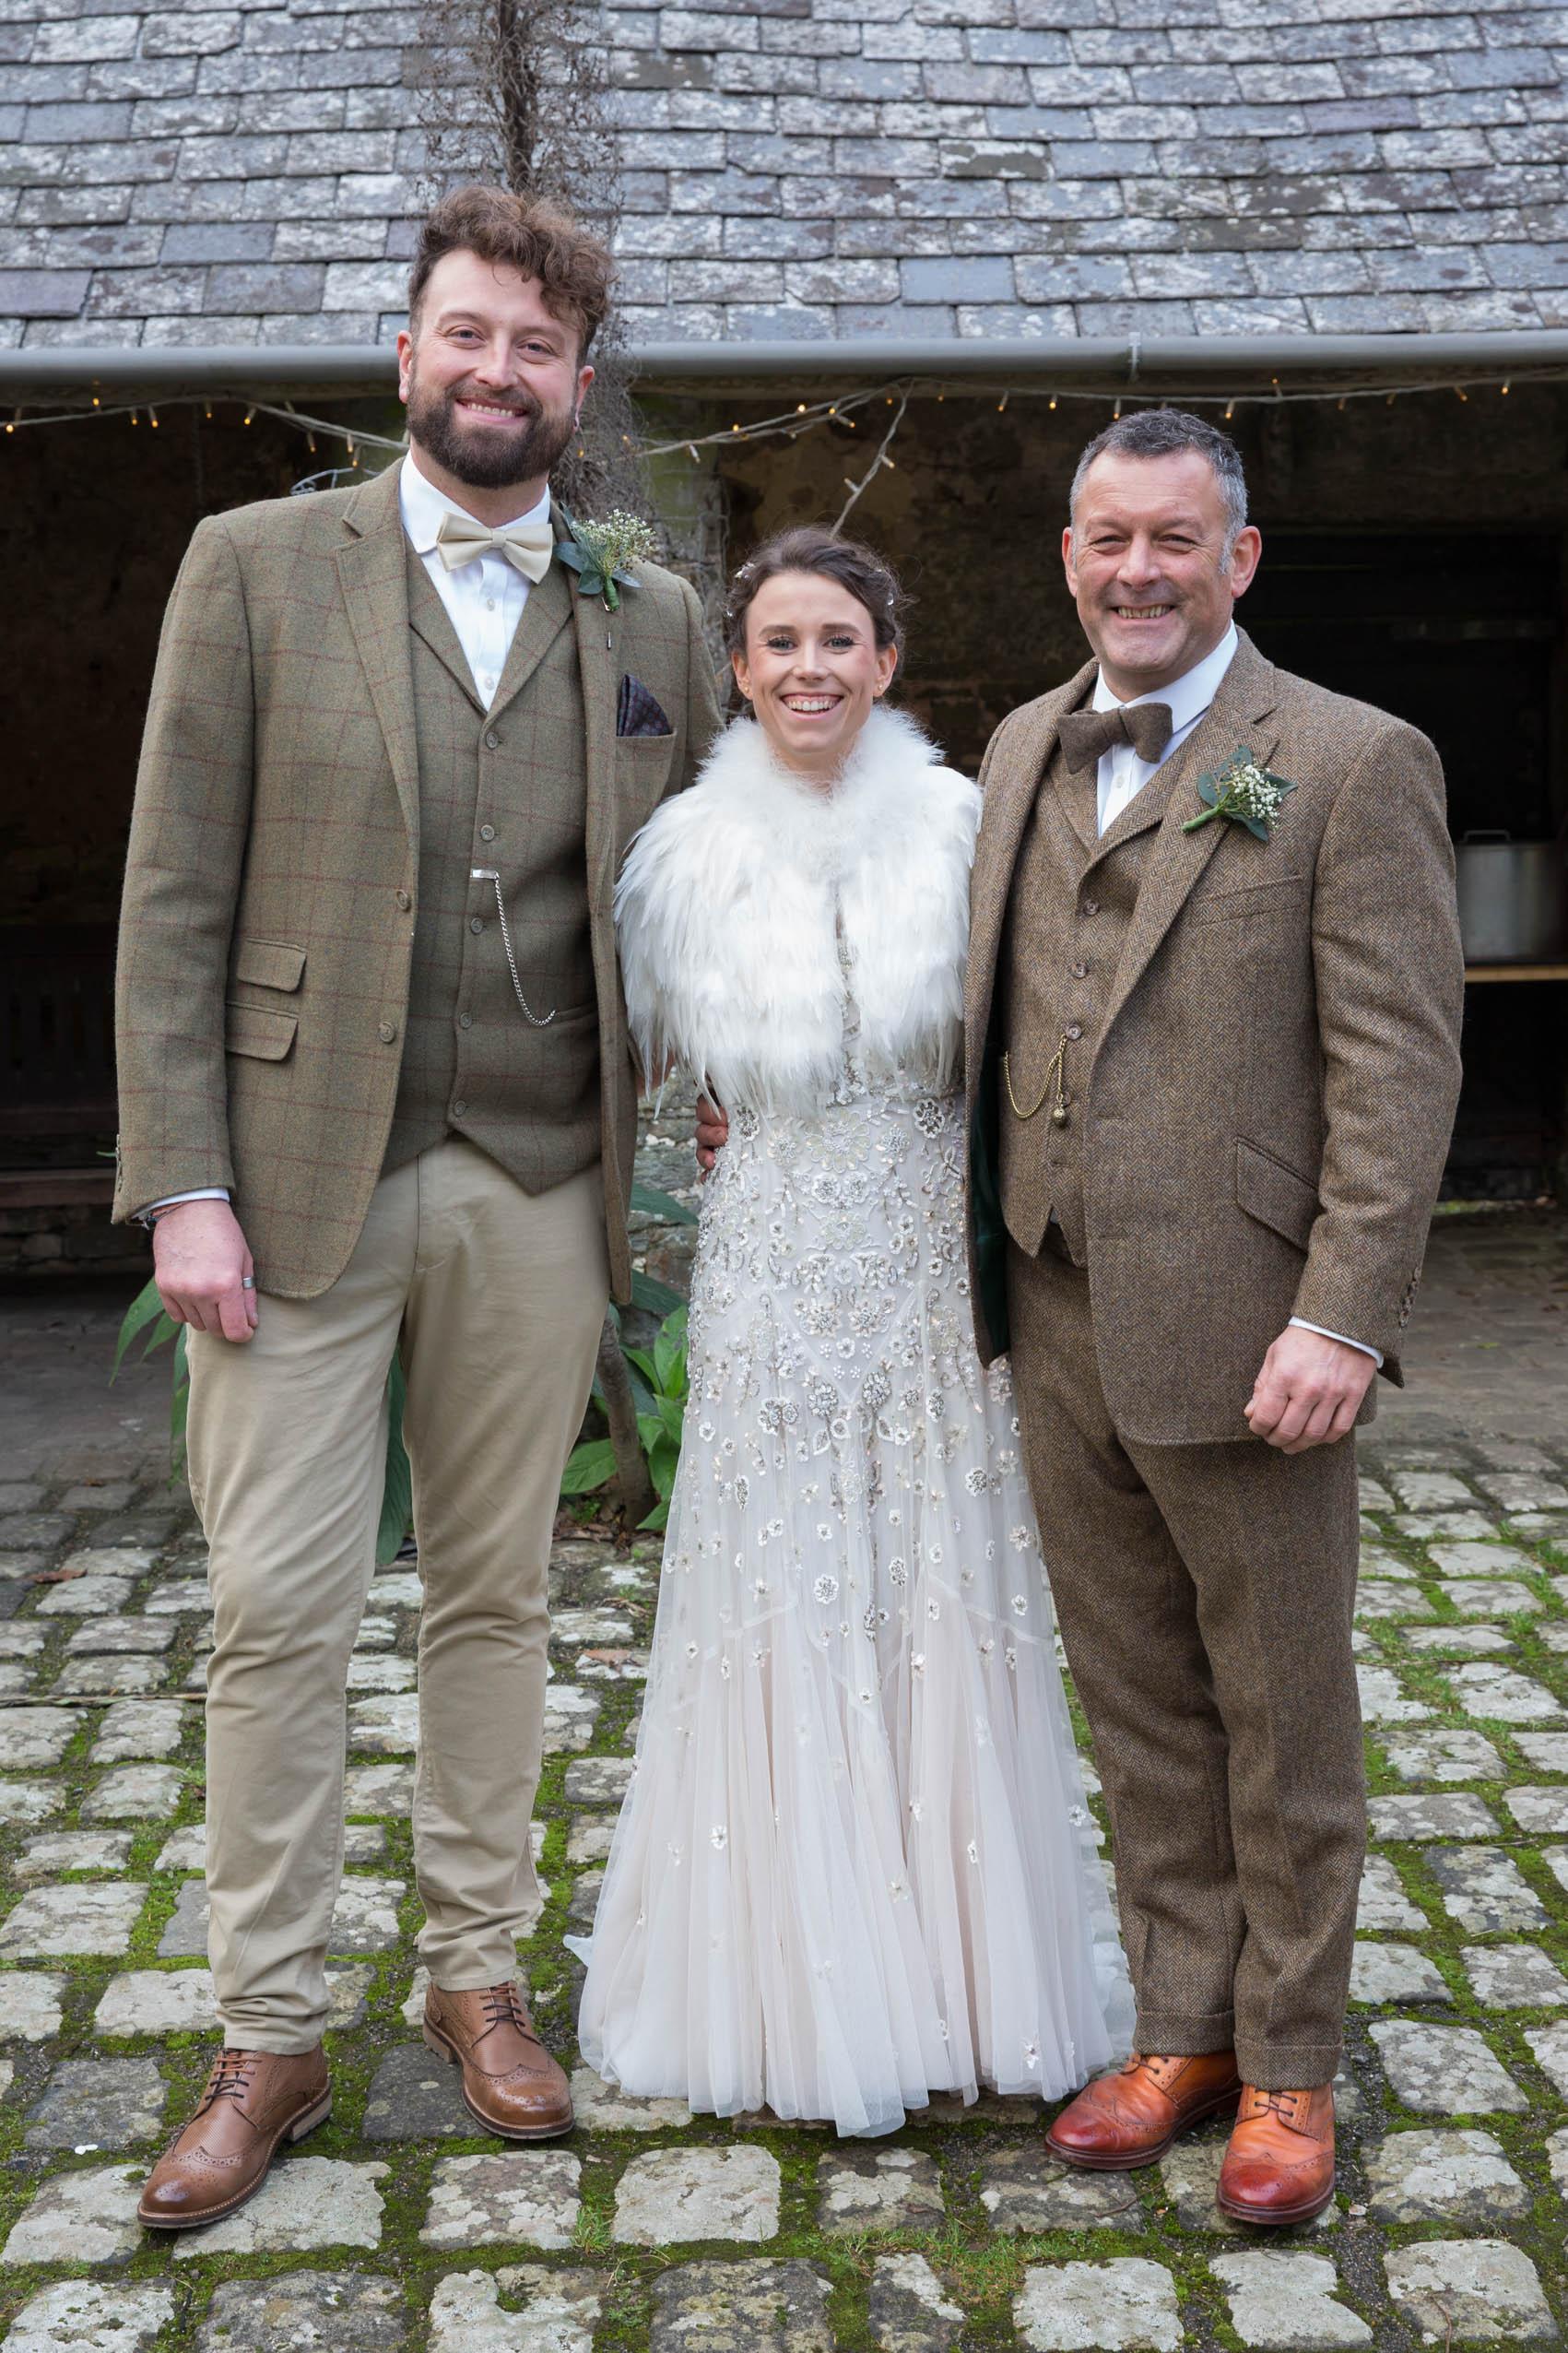 Jess & Ben - Bristol Wedding Photographer - Wright Wedding Photography - 102